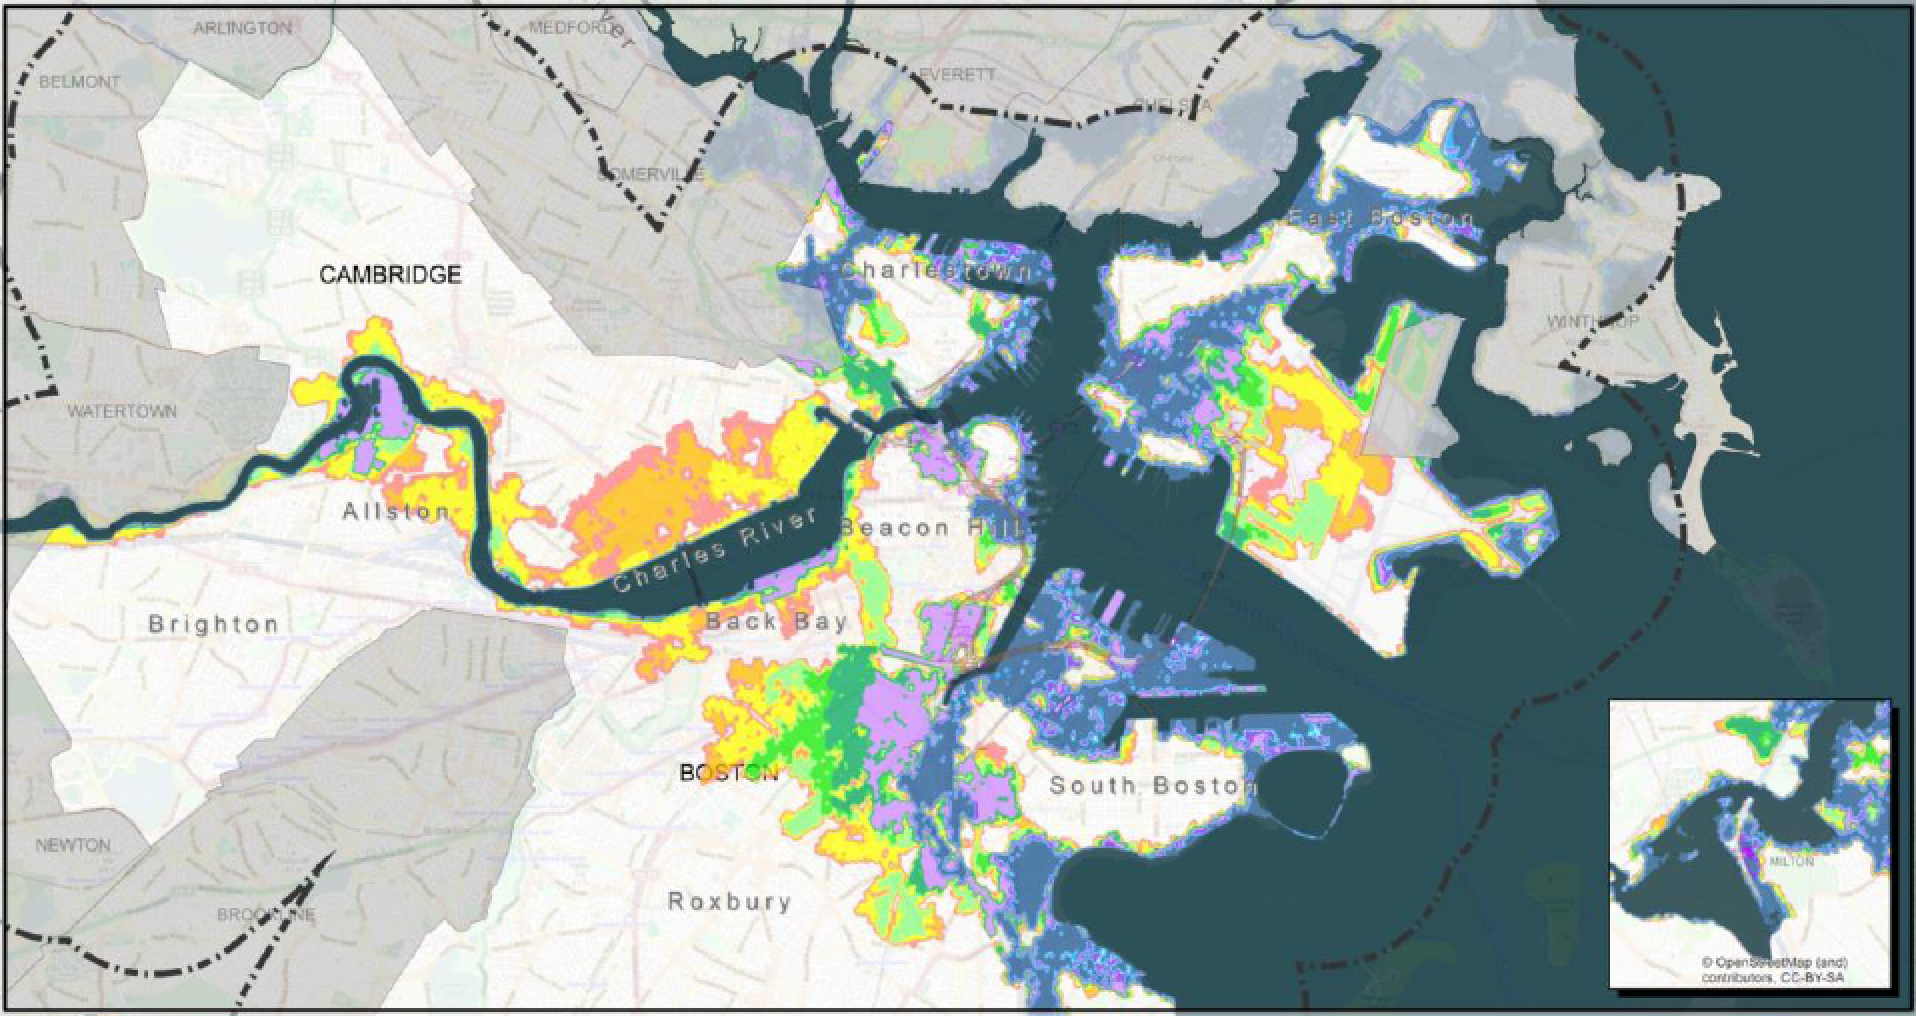 Boston Harbor Flood Exceedance Probabilities Map